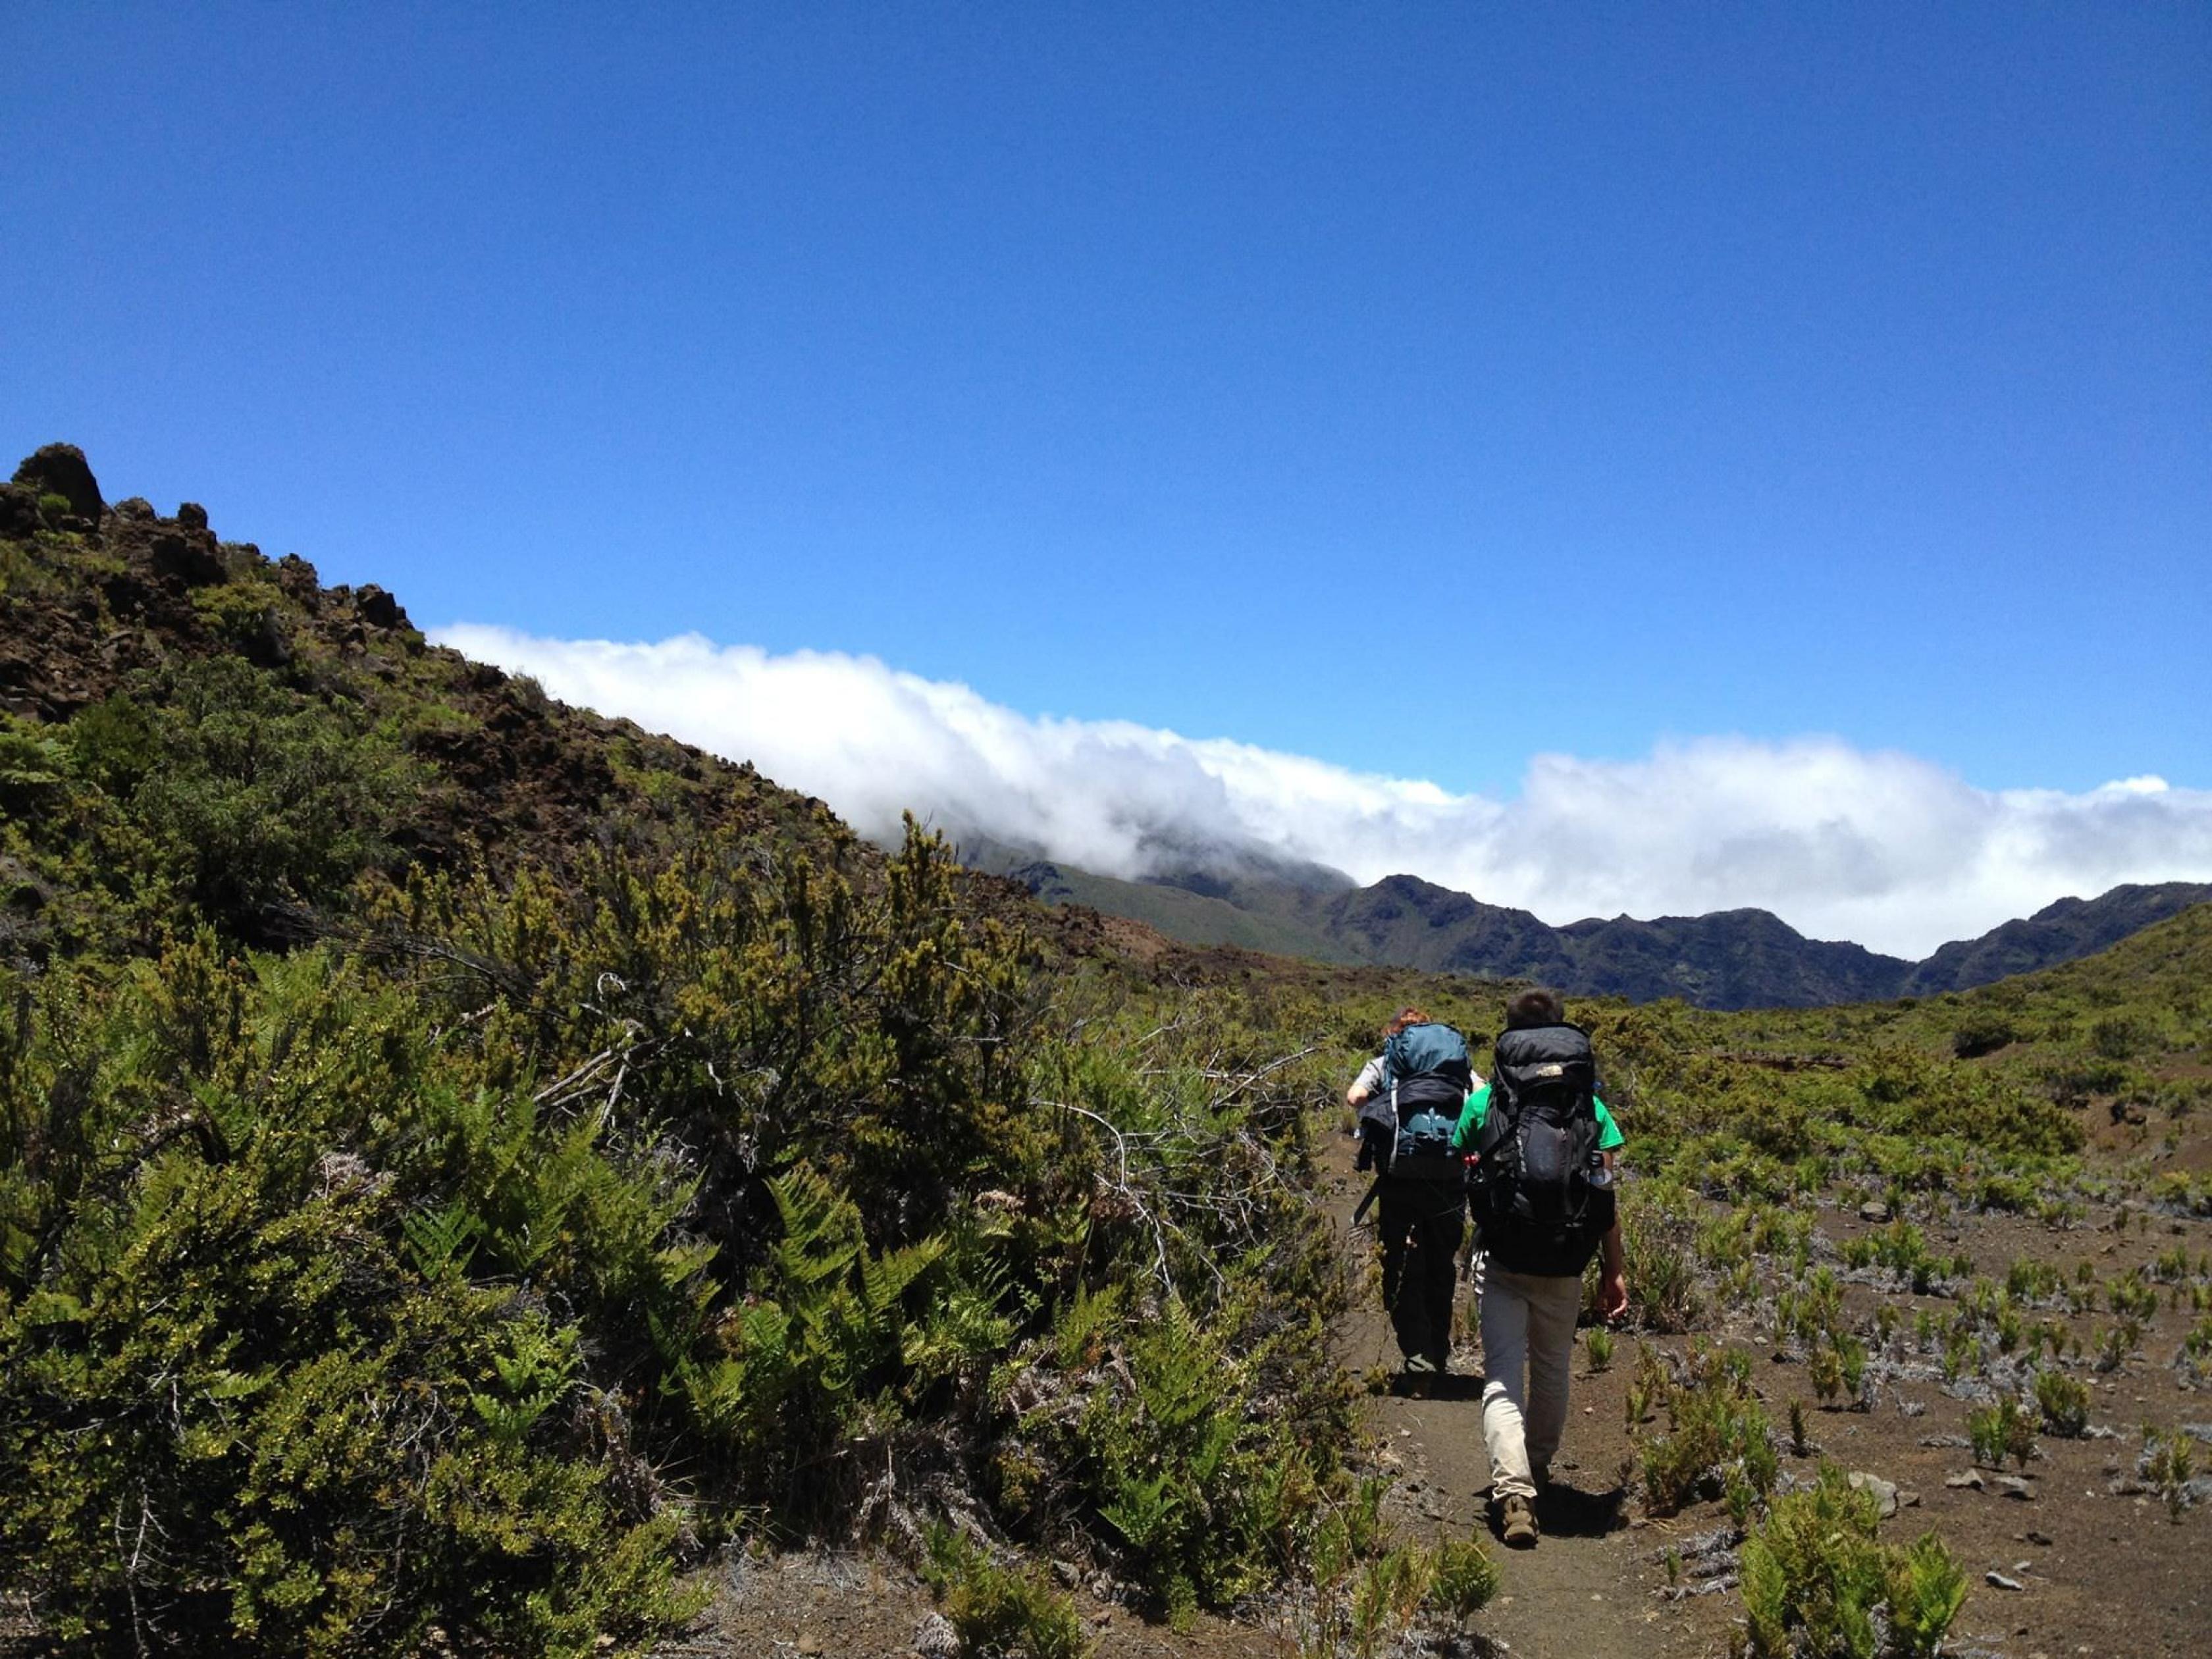 Backpackers head through Haleakala National Park.